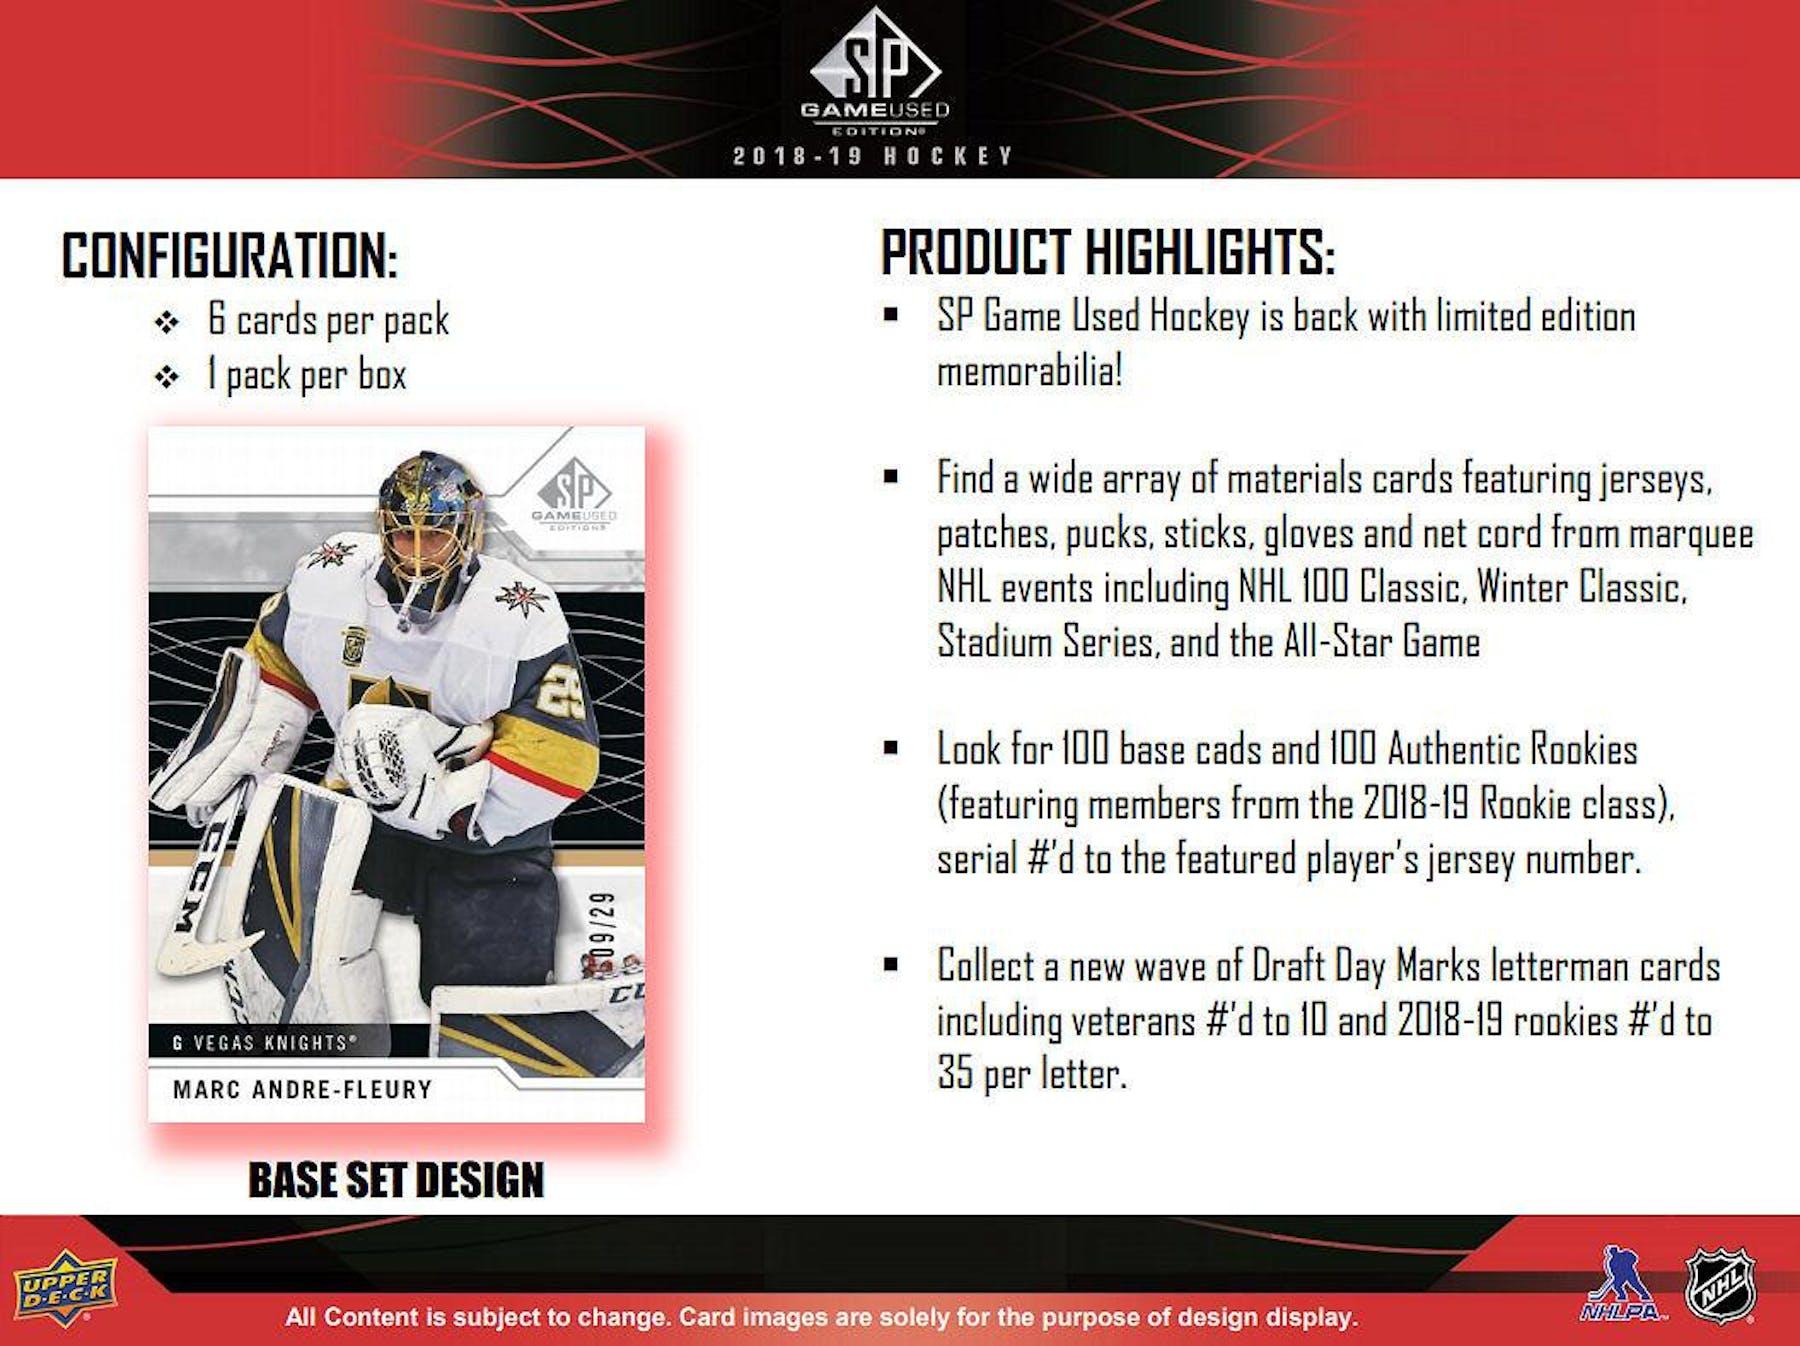 302df72ffe6 ... 2018 19 Upper Deck SP Game Used Hockey Hobby Box